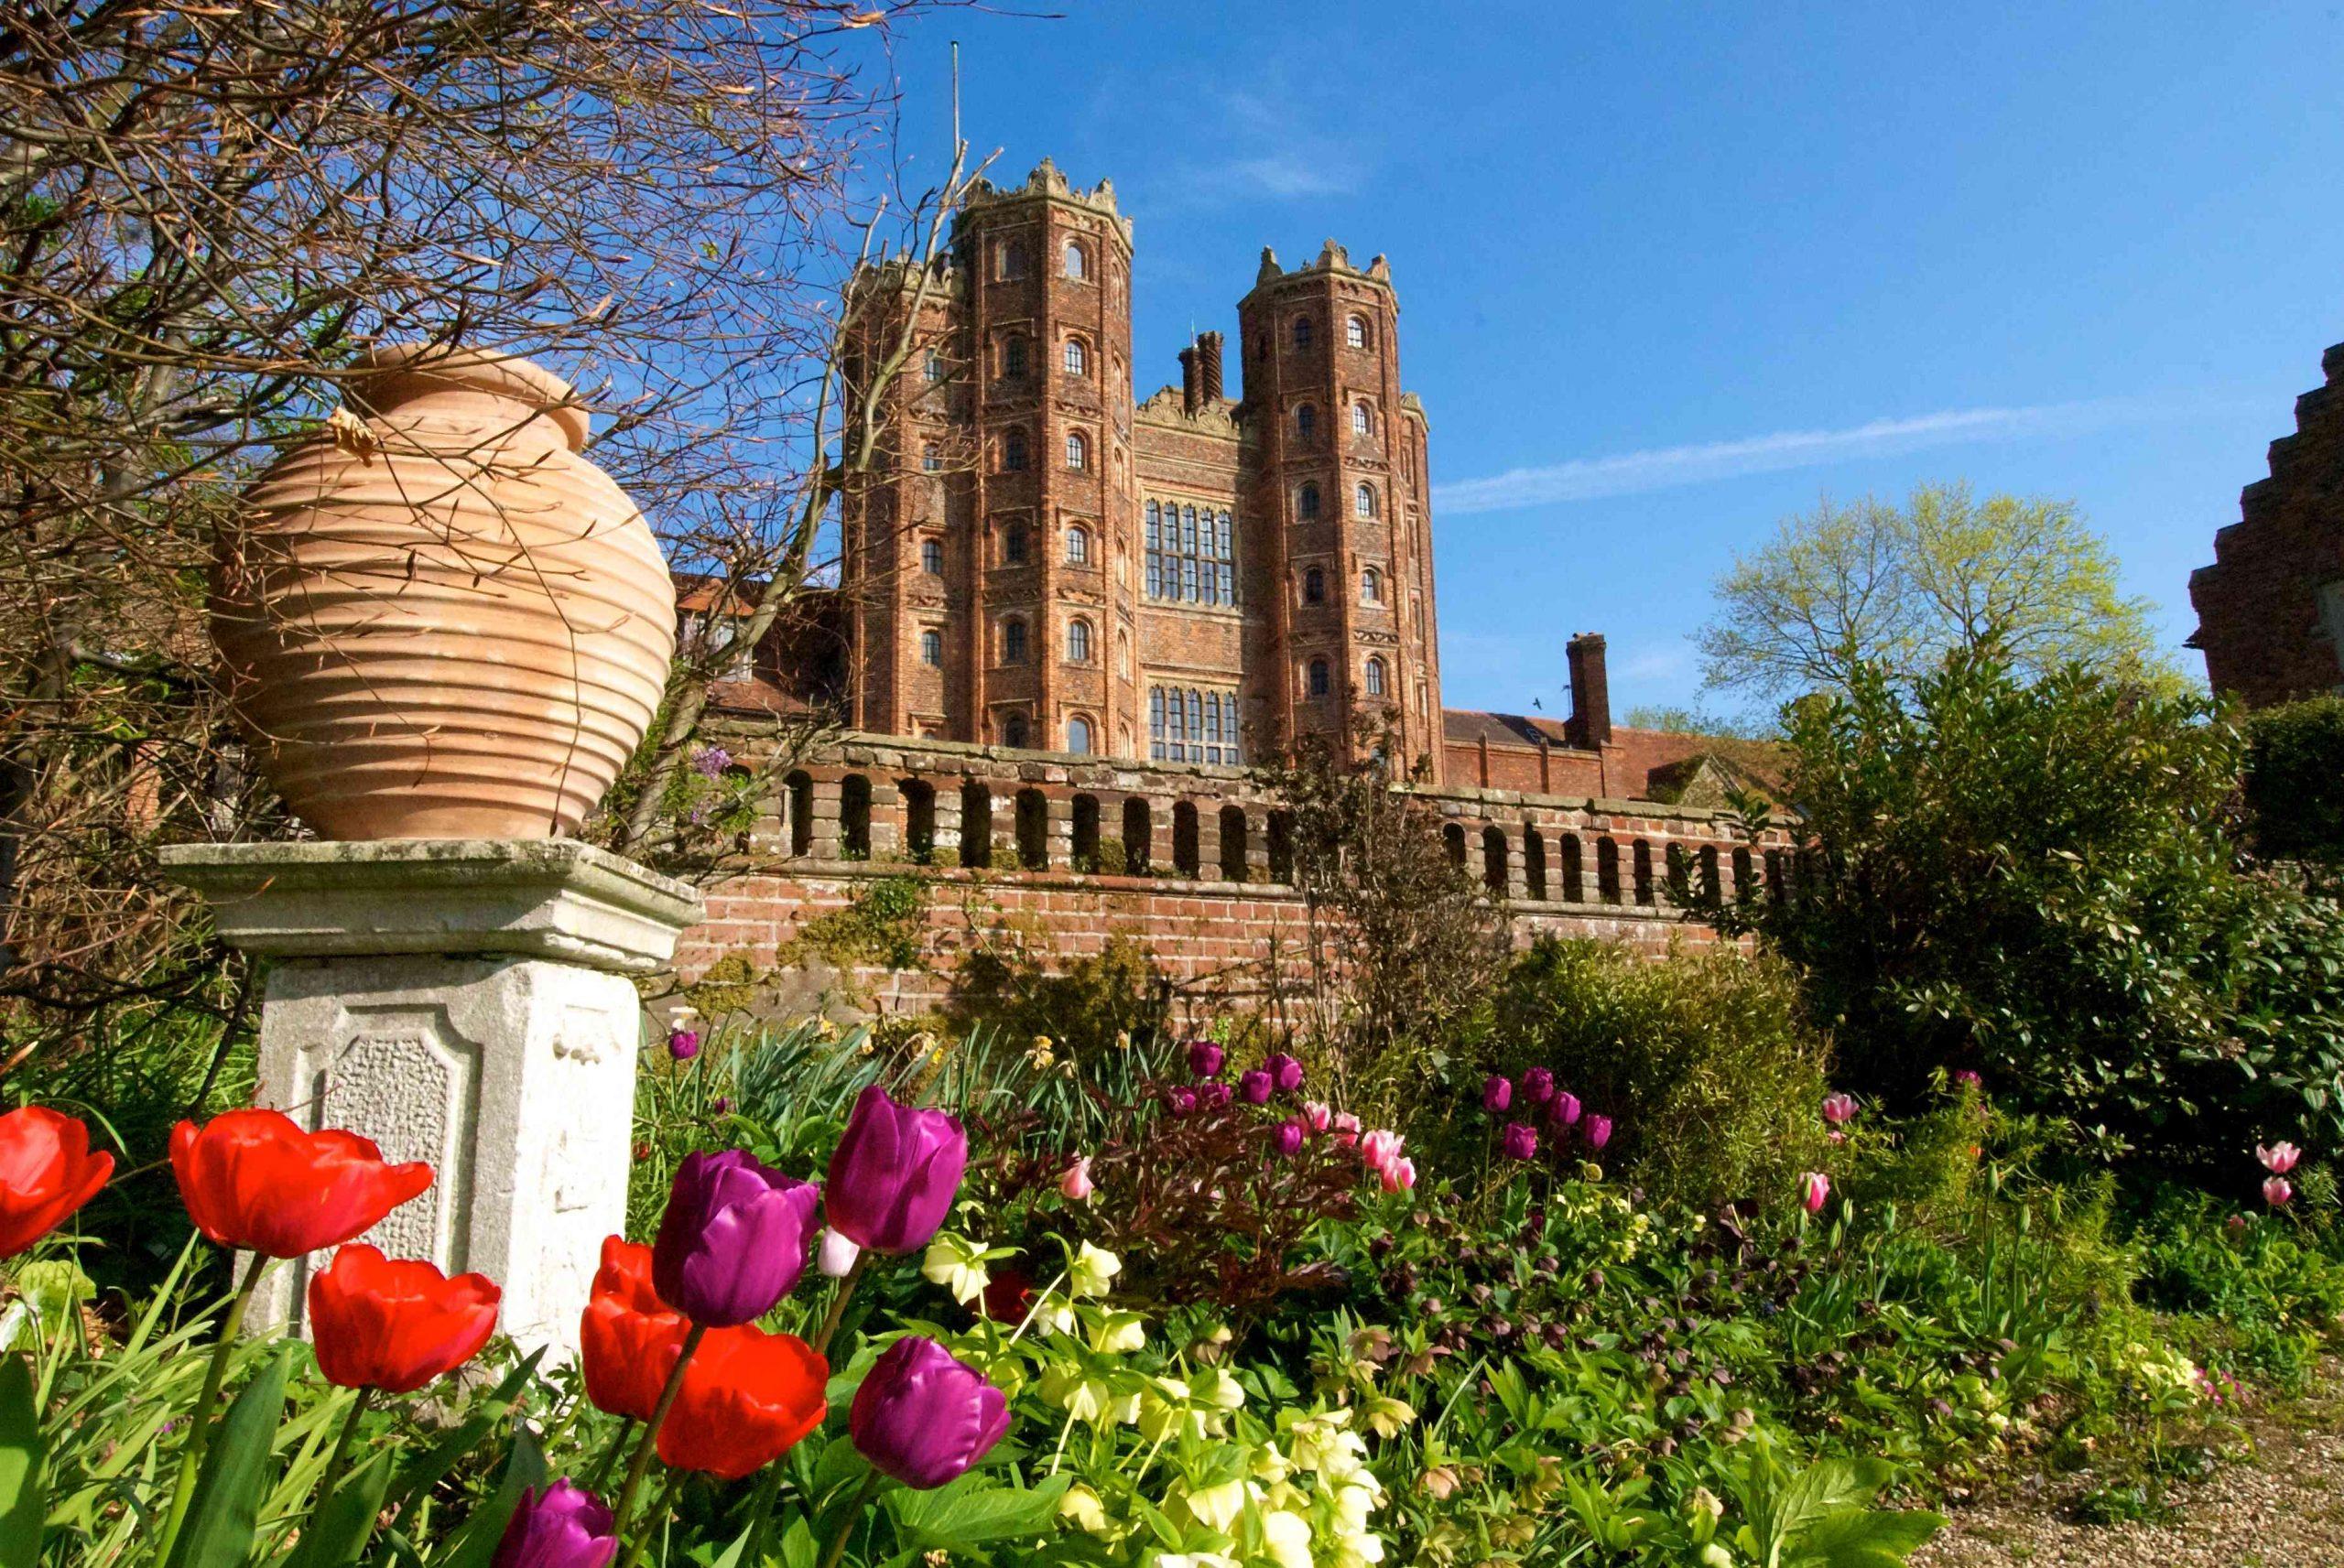 Historic house wedding venue, garden, tulips, Tudor building